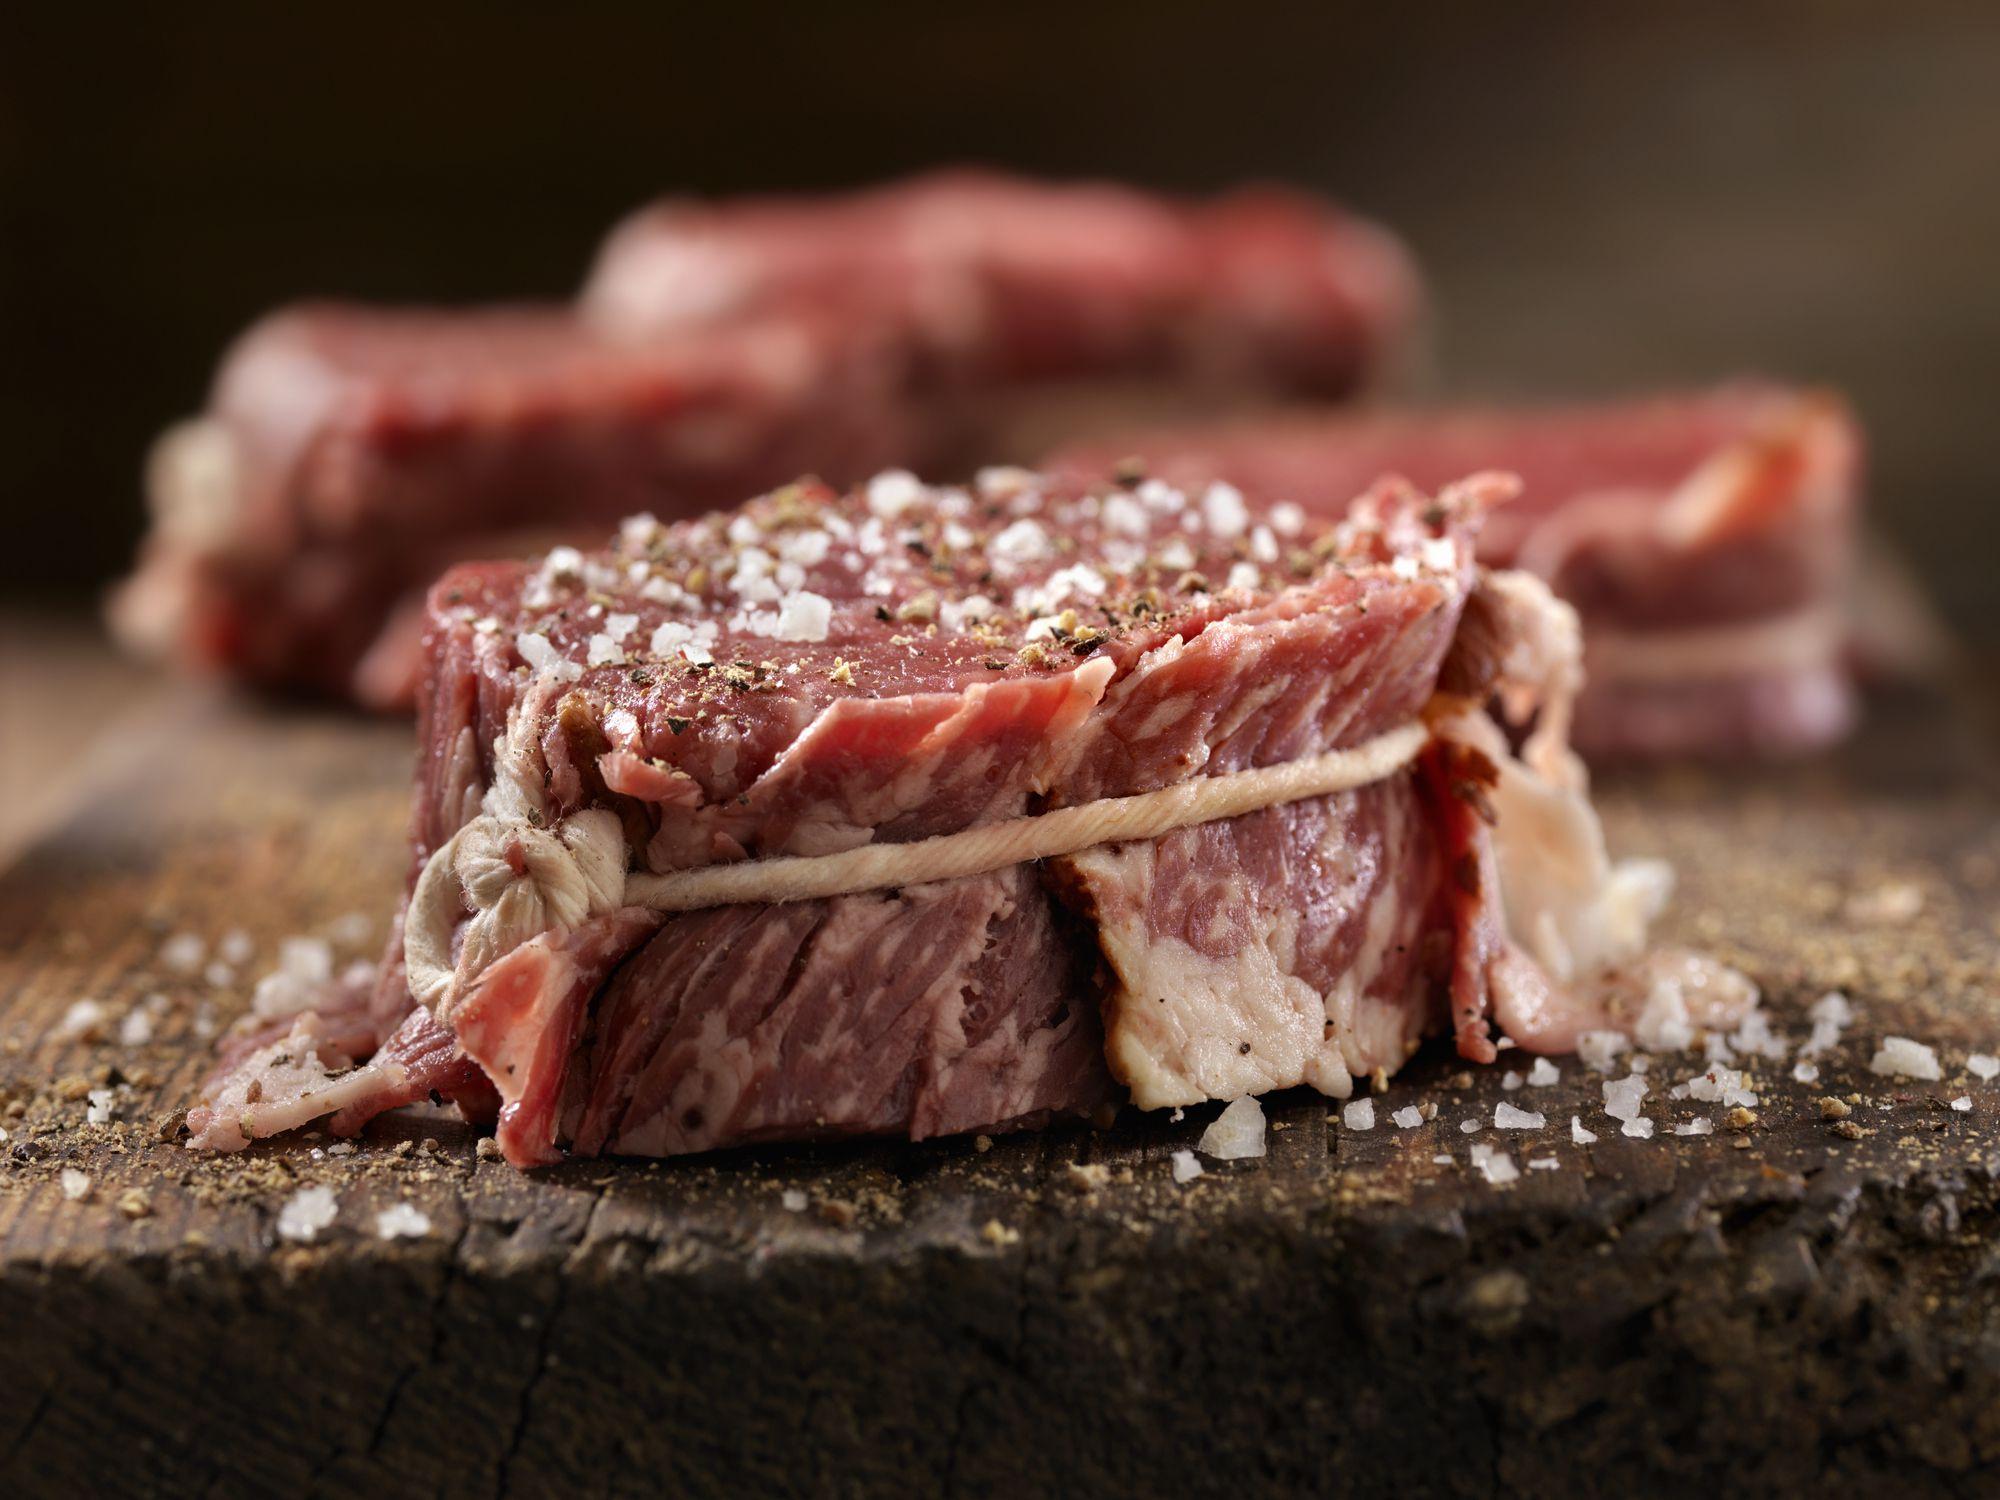 When Seasoning Your Steak For The Grill Keep It Simple Watermelon Wallpaper Rainbow Find Free HD for Desktop [freshlhys.tk]